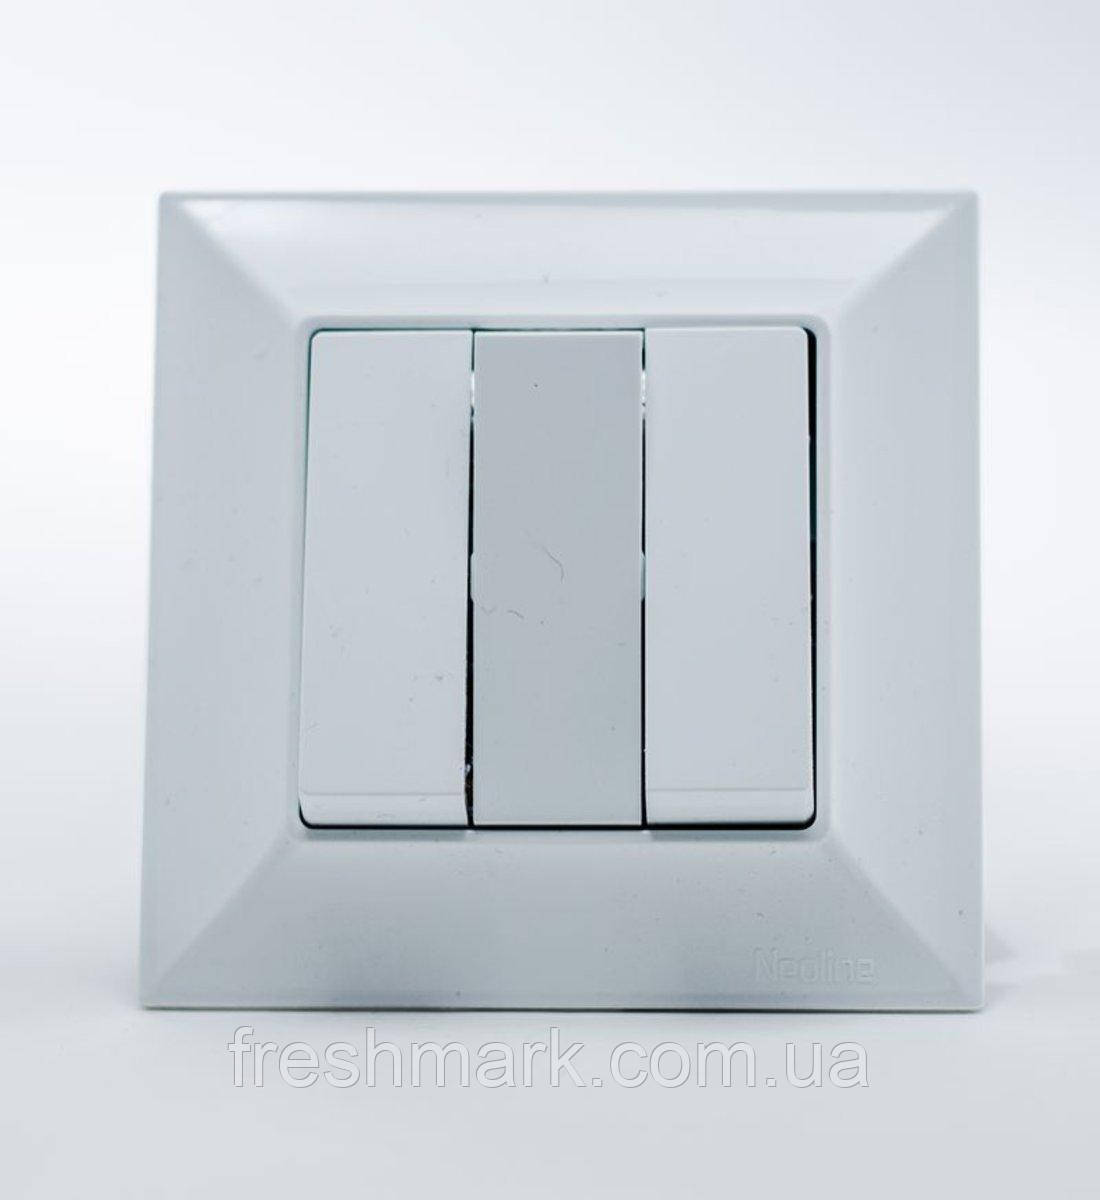 Выключатель трехклавишный  GUNSAN Neoline Белый